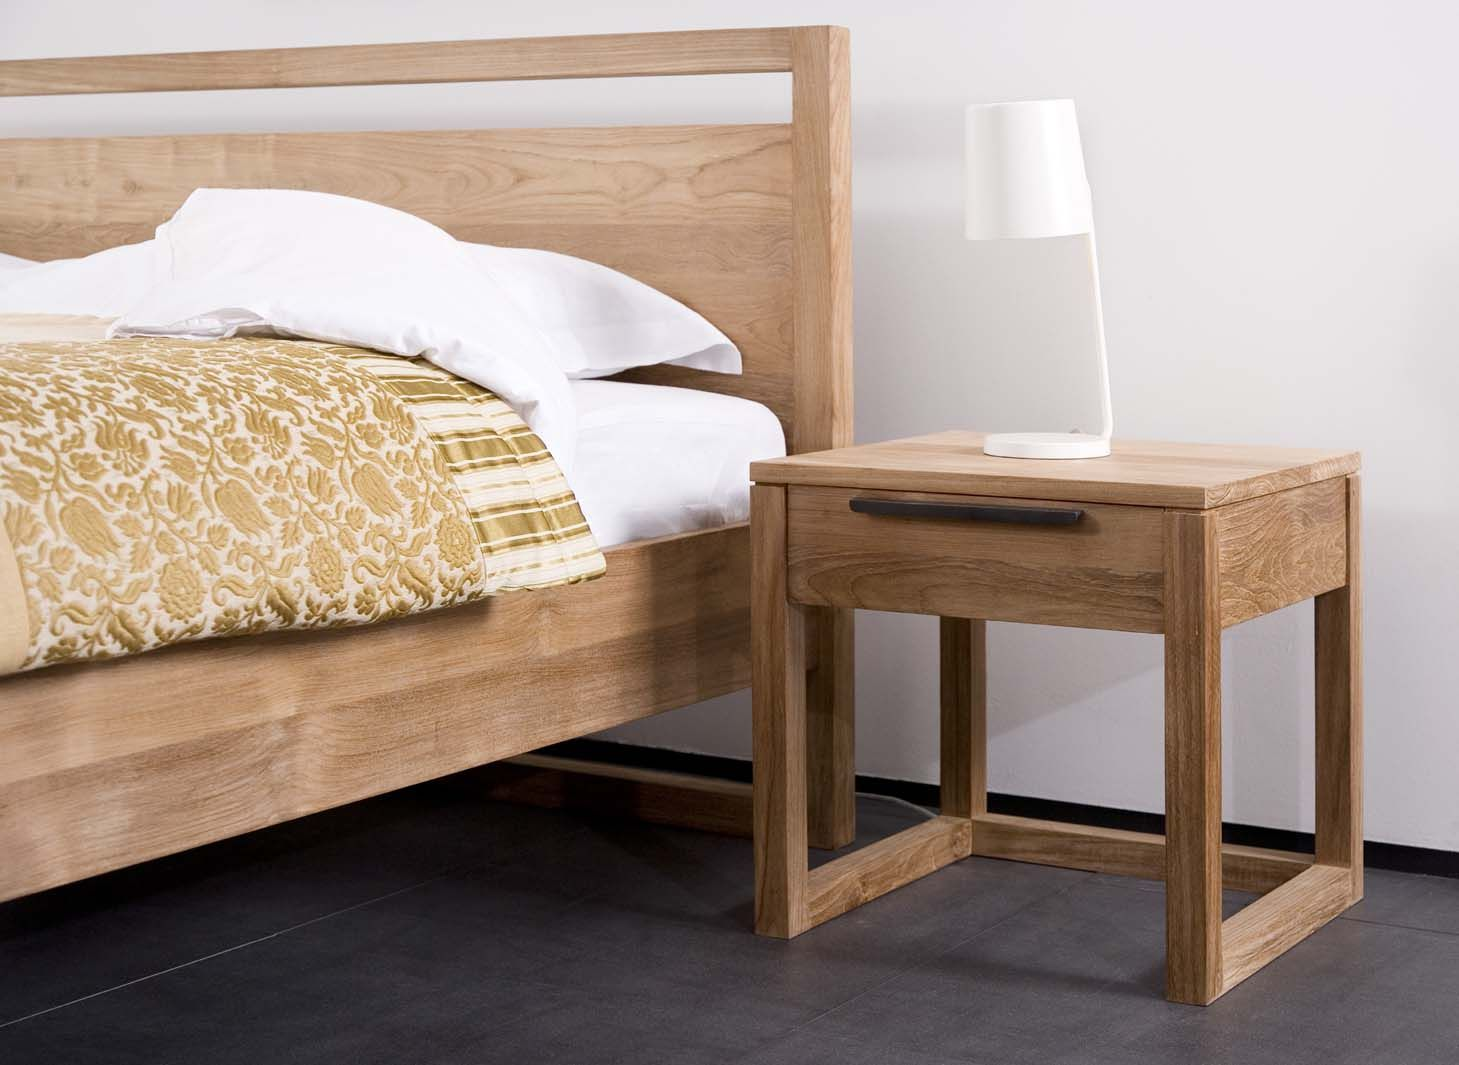 Master bedroom nightstand decor  Ethnicraft Light Frame Nightstand  WFH  Master Bedroom